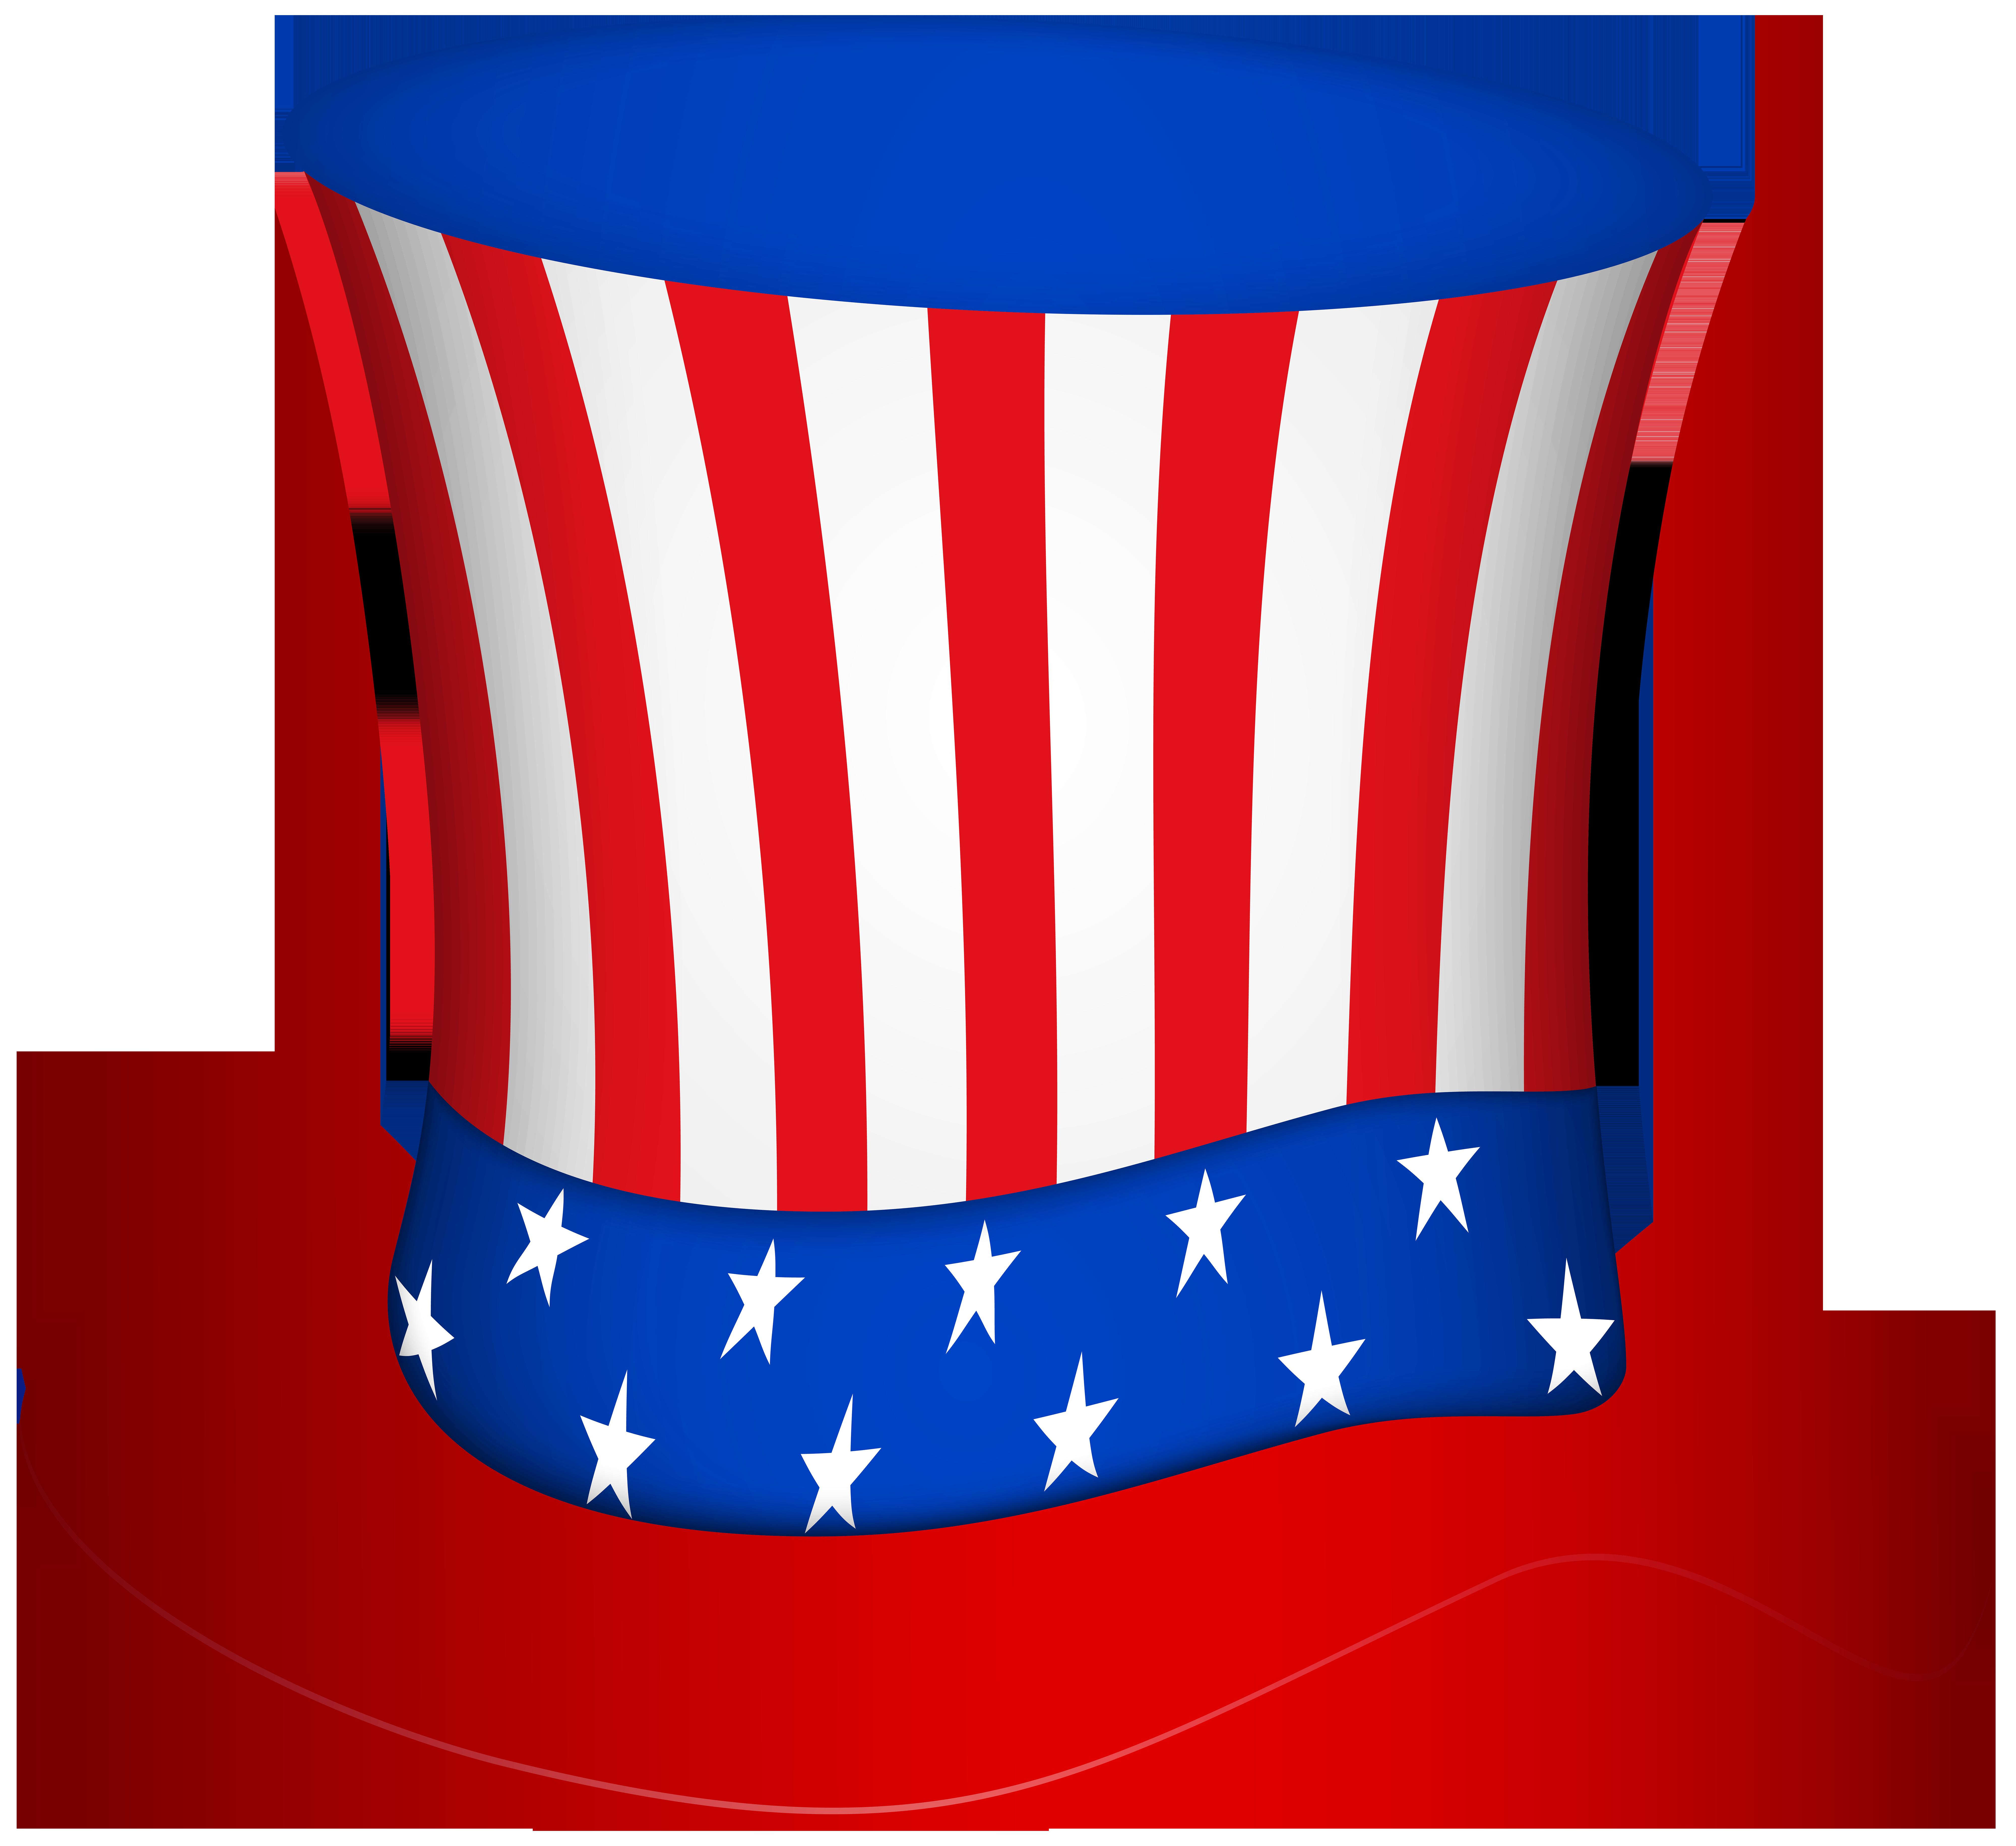 Free clipart uncle sam taking money jpg transparent download Uncle Sam Hat PNG Transparent Clip Art Image | Gallery Yopriceville ... jpg transparent download